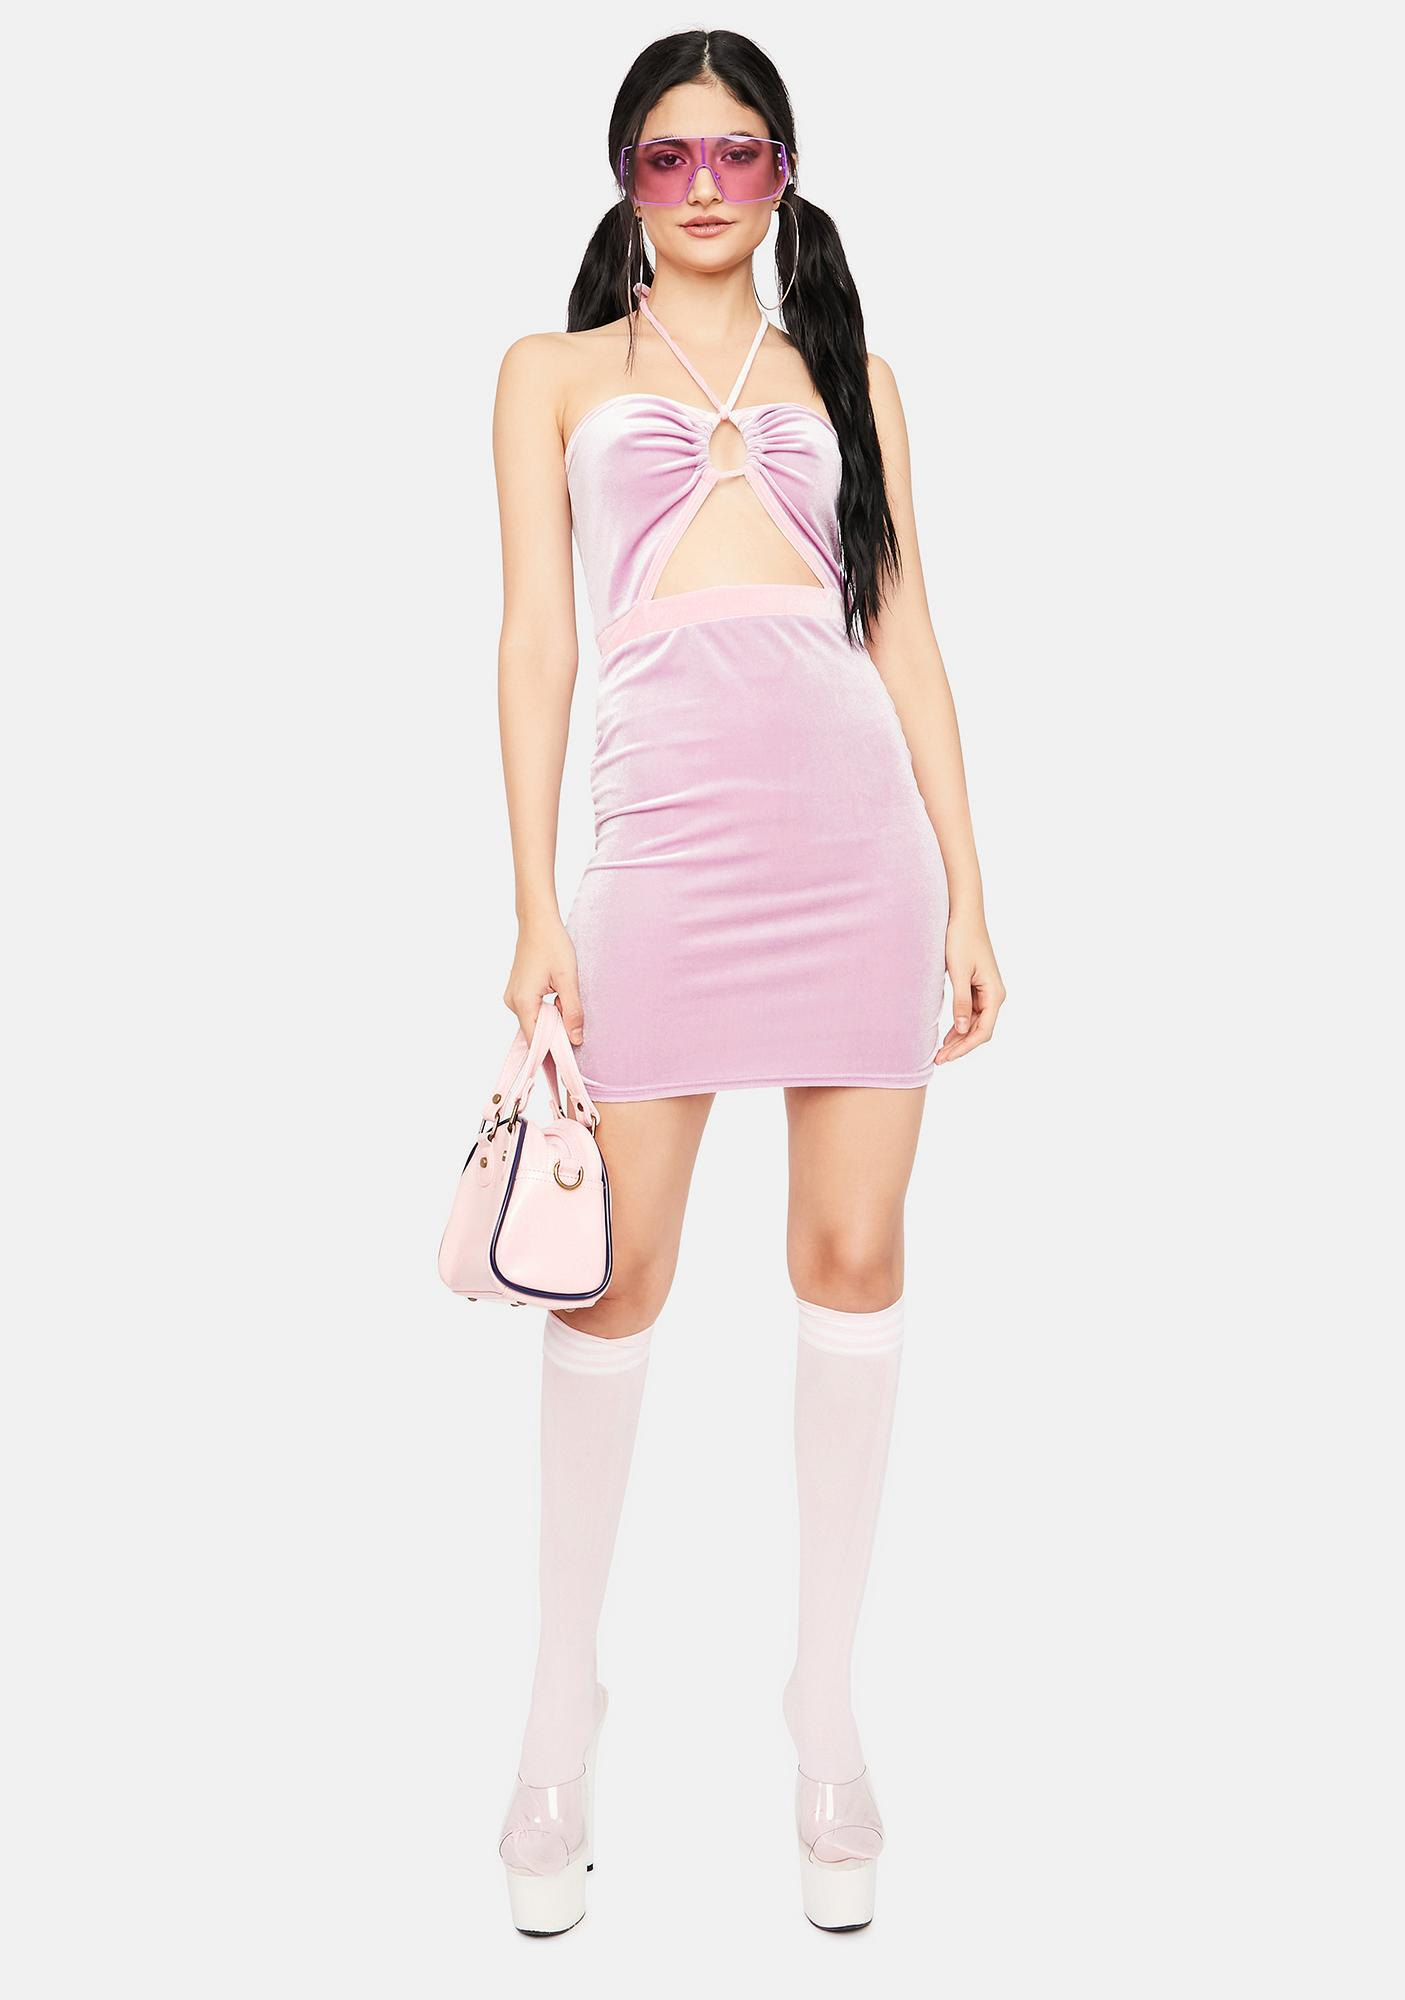 Mauve Trust In Chic Velour Halter Dress